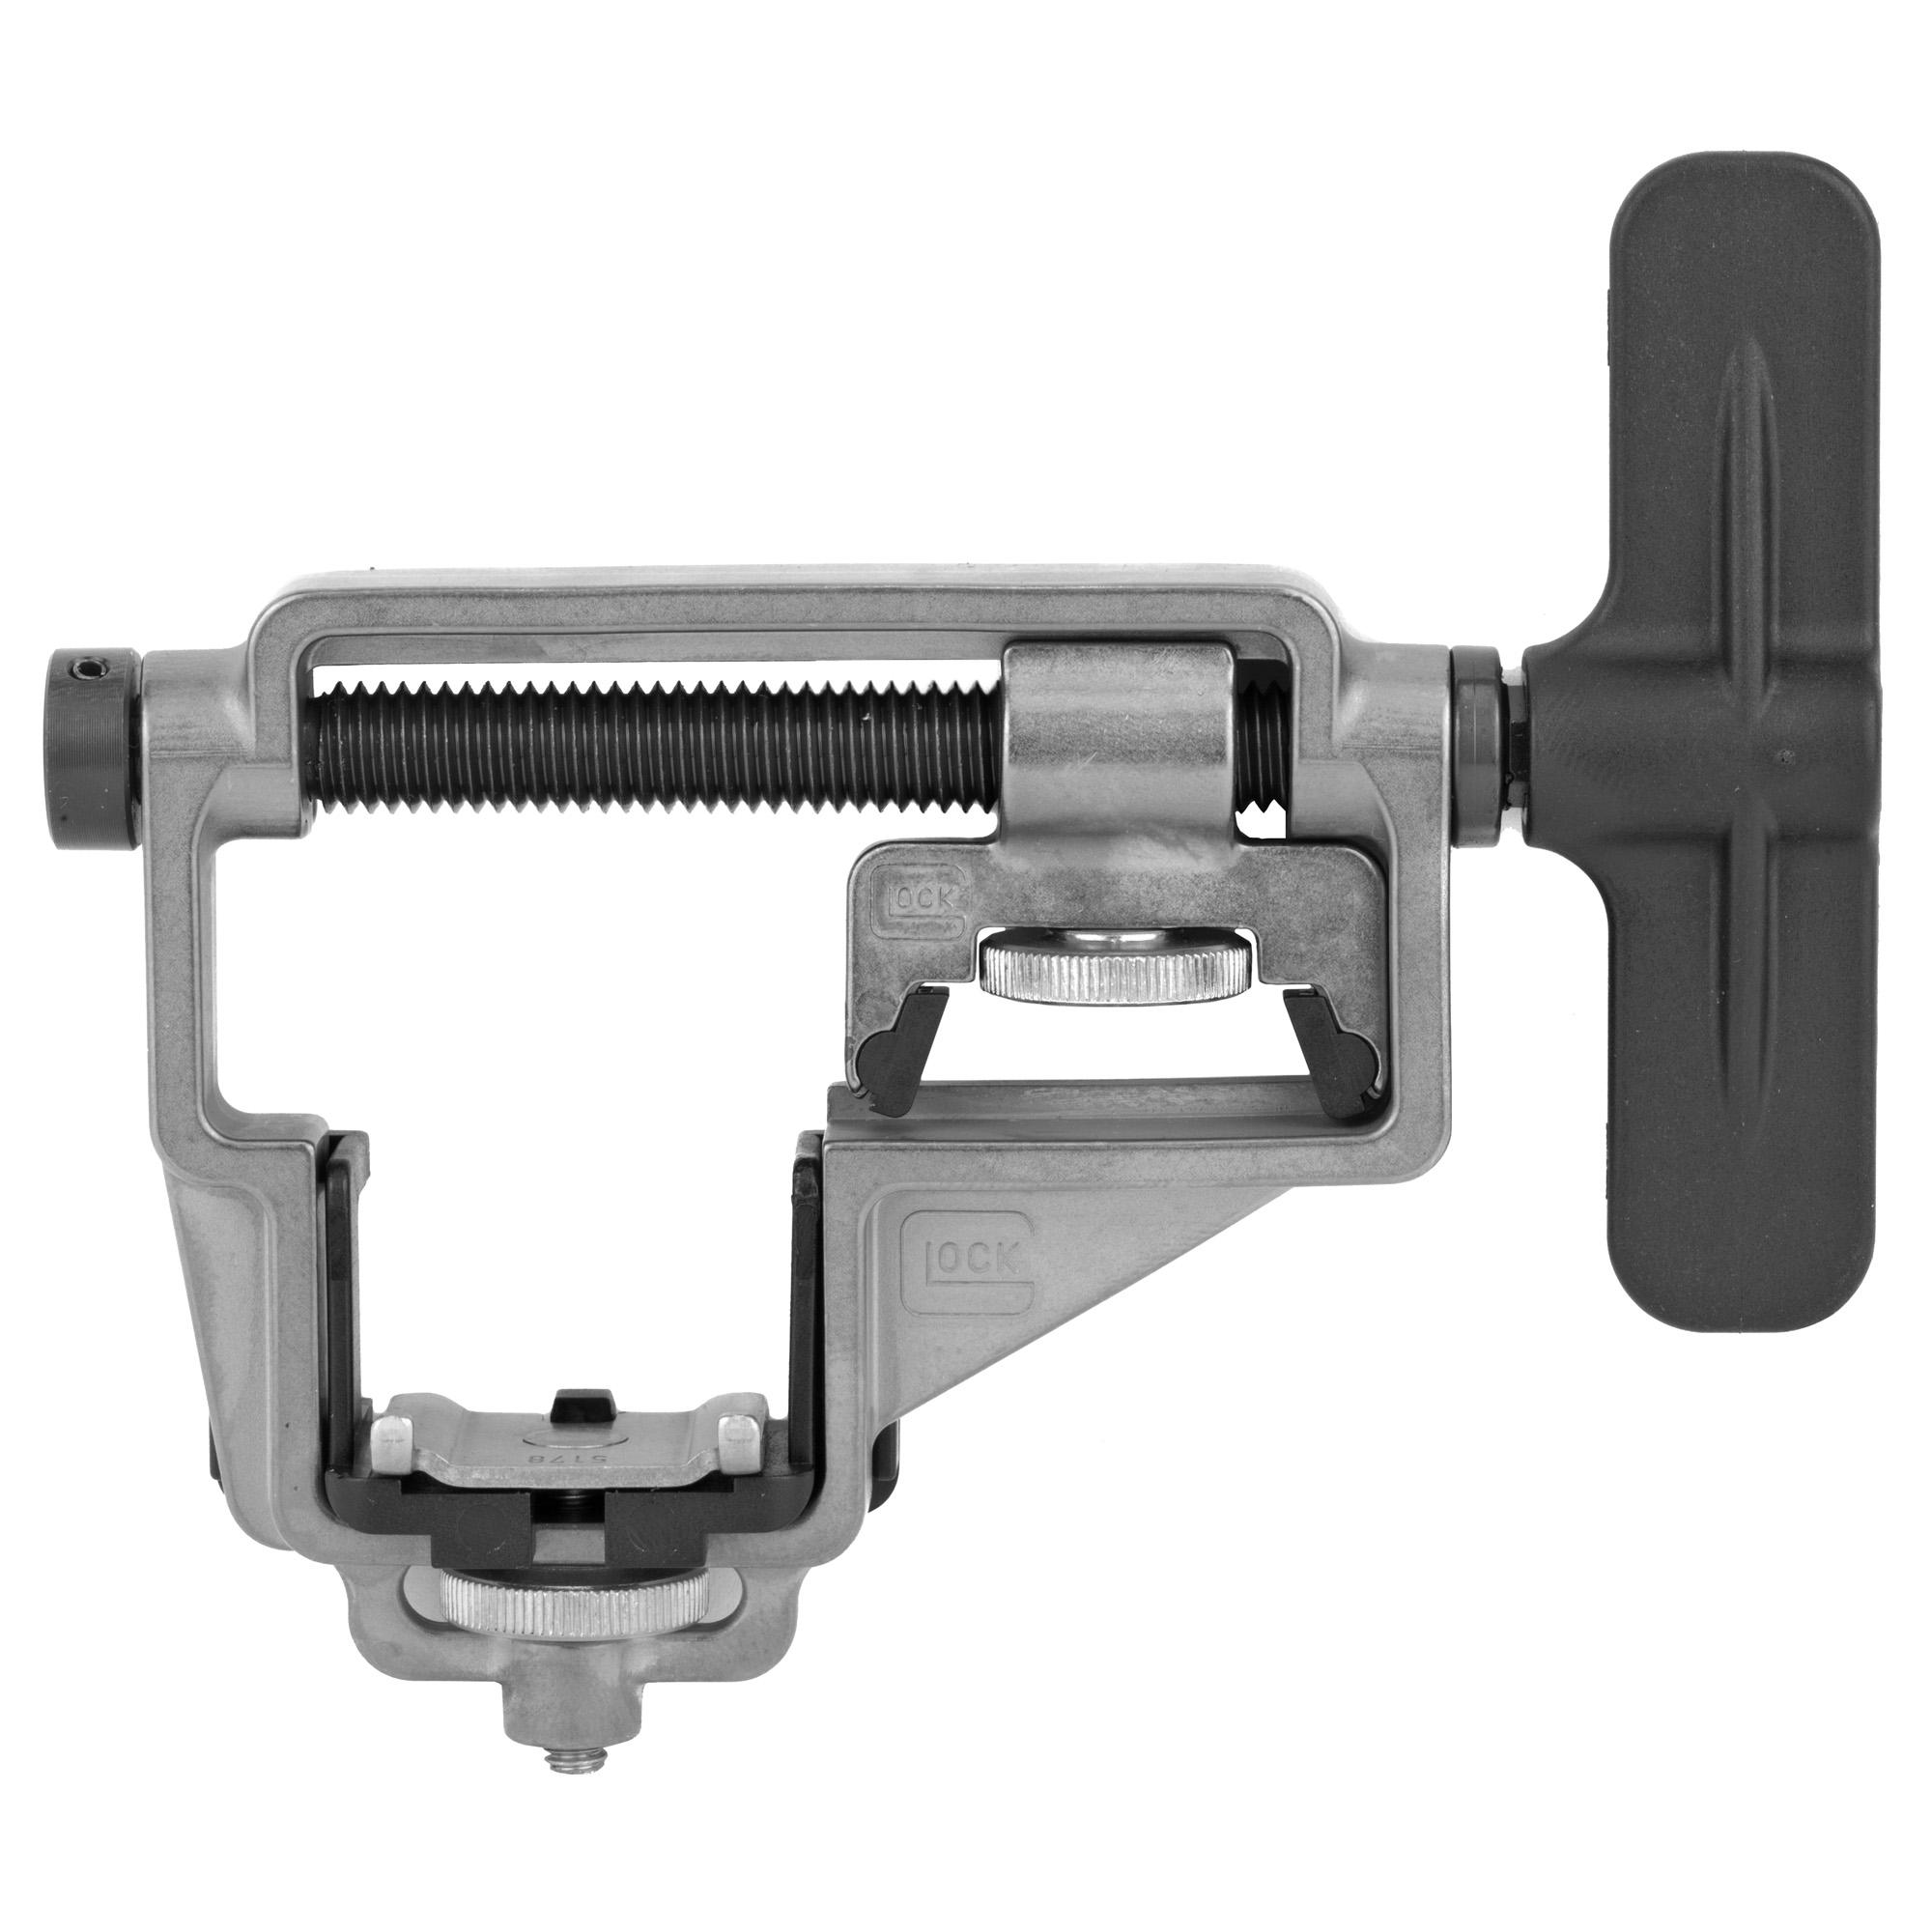 Glock Oem Sight Tool For All Models